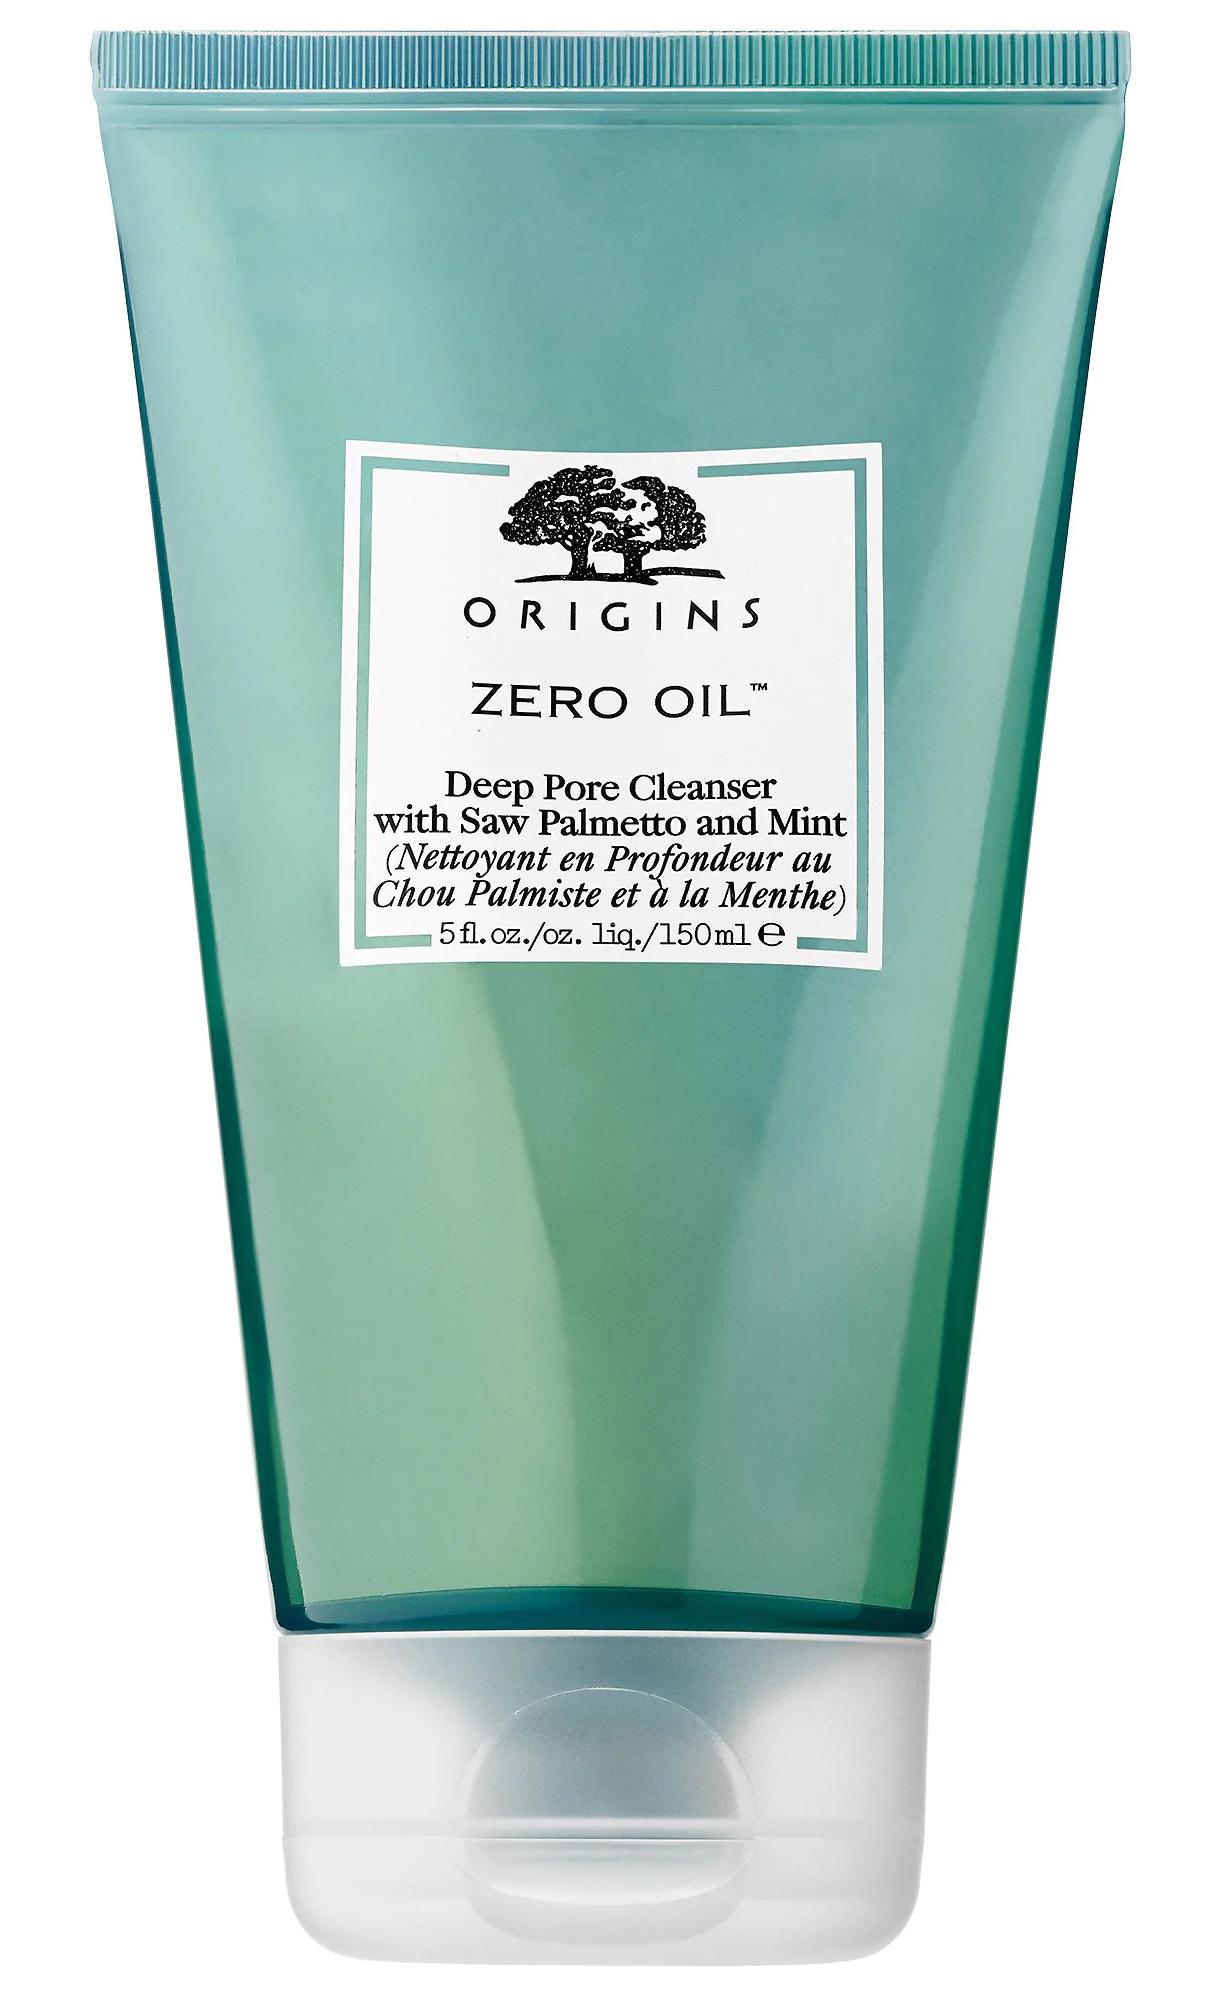 Origins Zero Oil Deep Pore Cleanser With Saw Palmetto & Mint